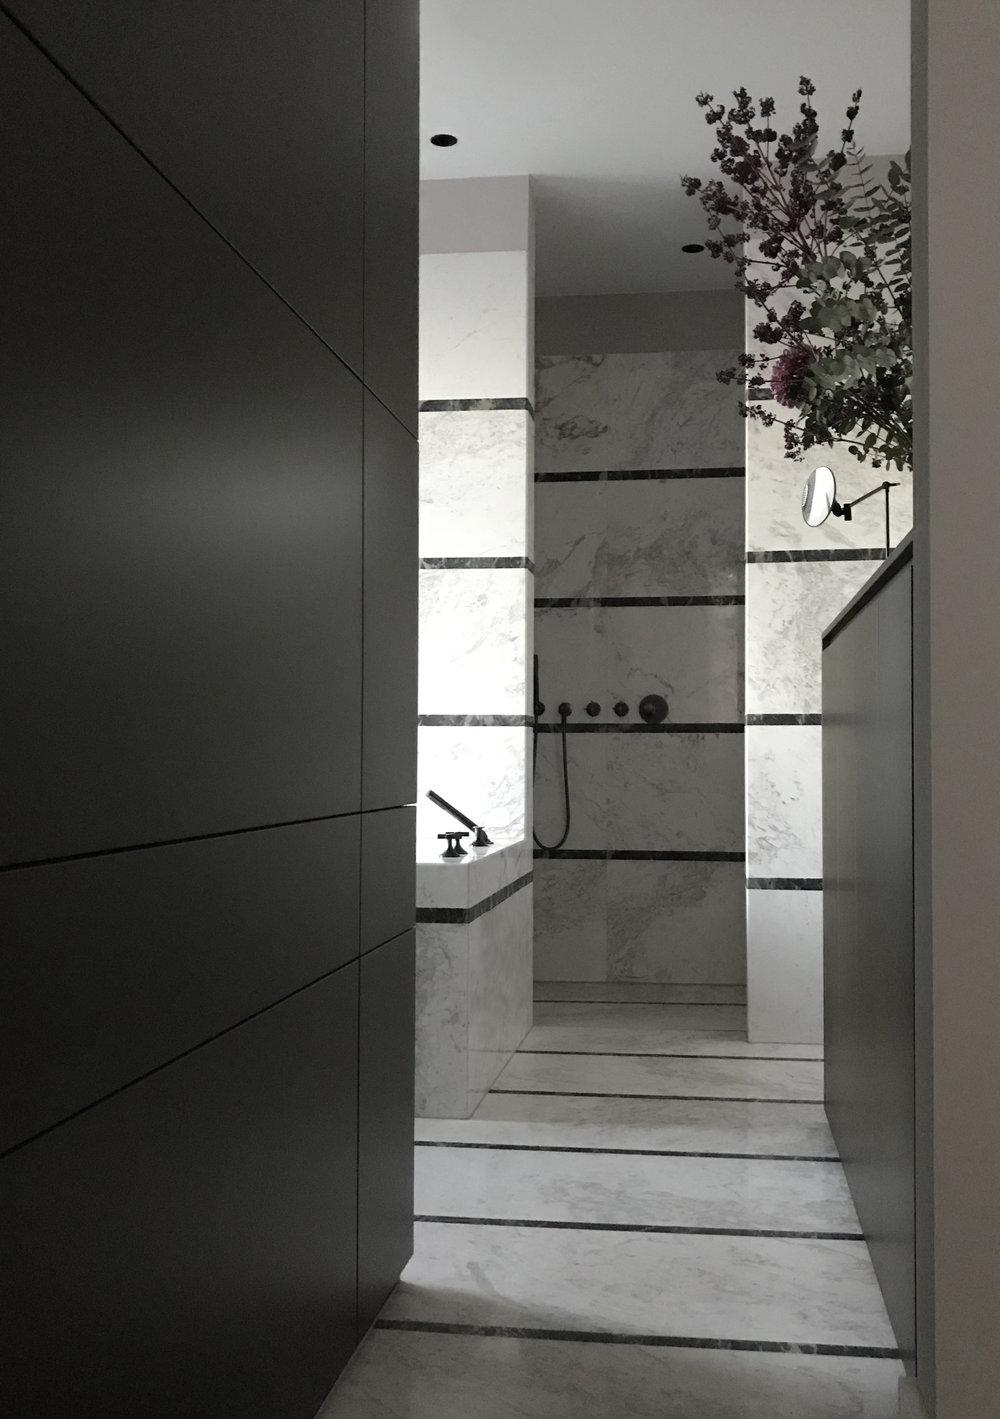 003 lex de gooijer interiors 24 bathroom design.jpg